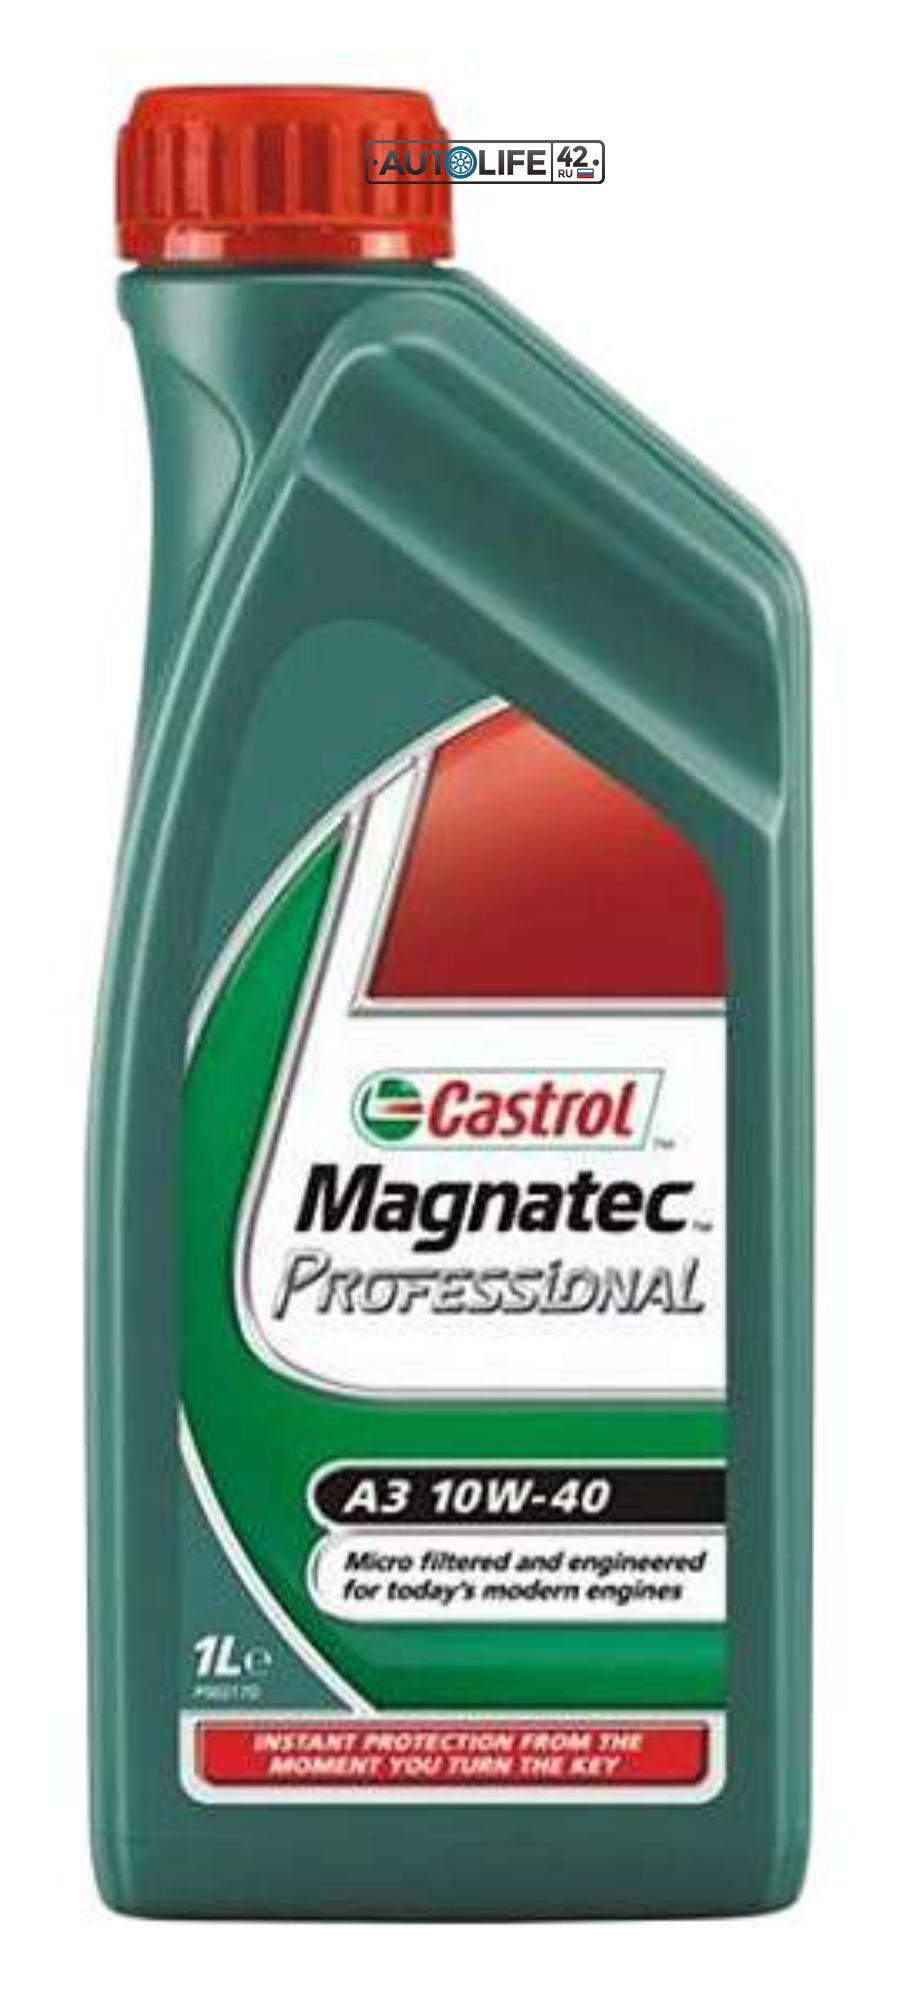 Масло моторное полусинтетическое Magnatec Professional A3 10W-40, 1л